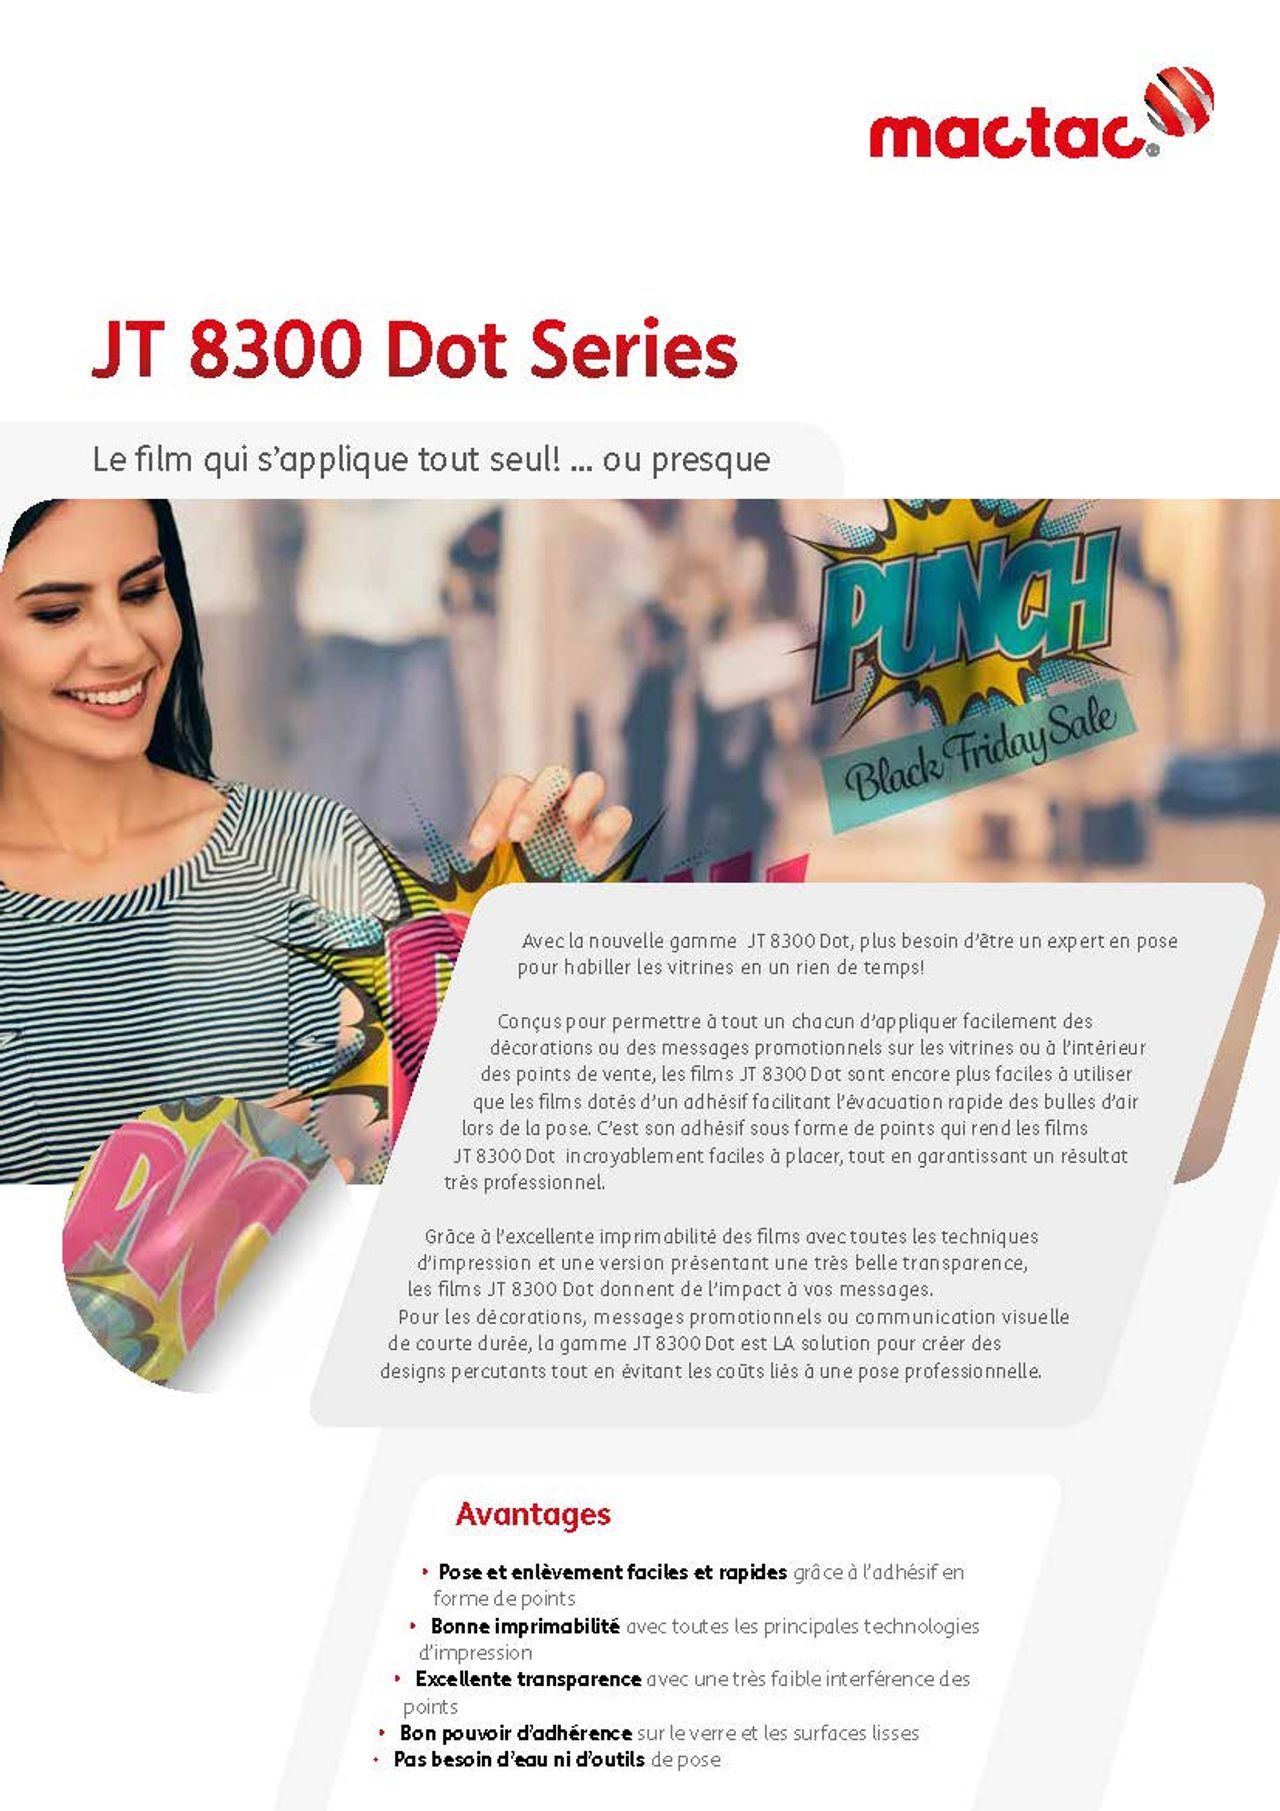 Image Brochure JT 8300 Dot Series